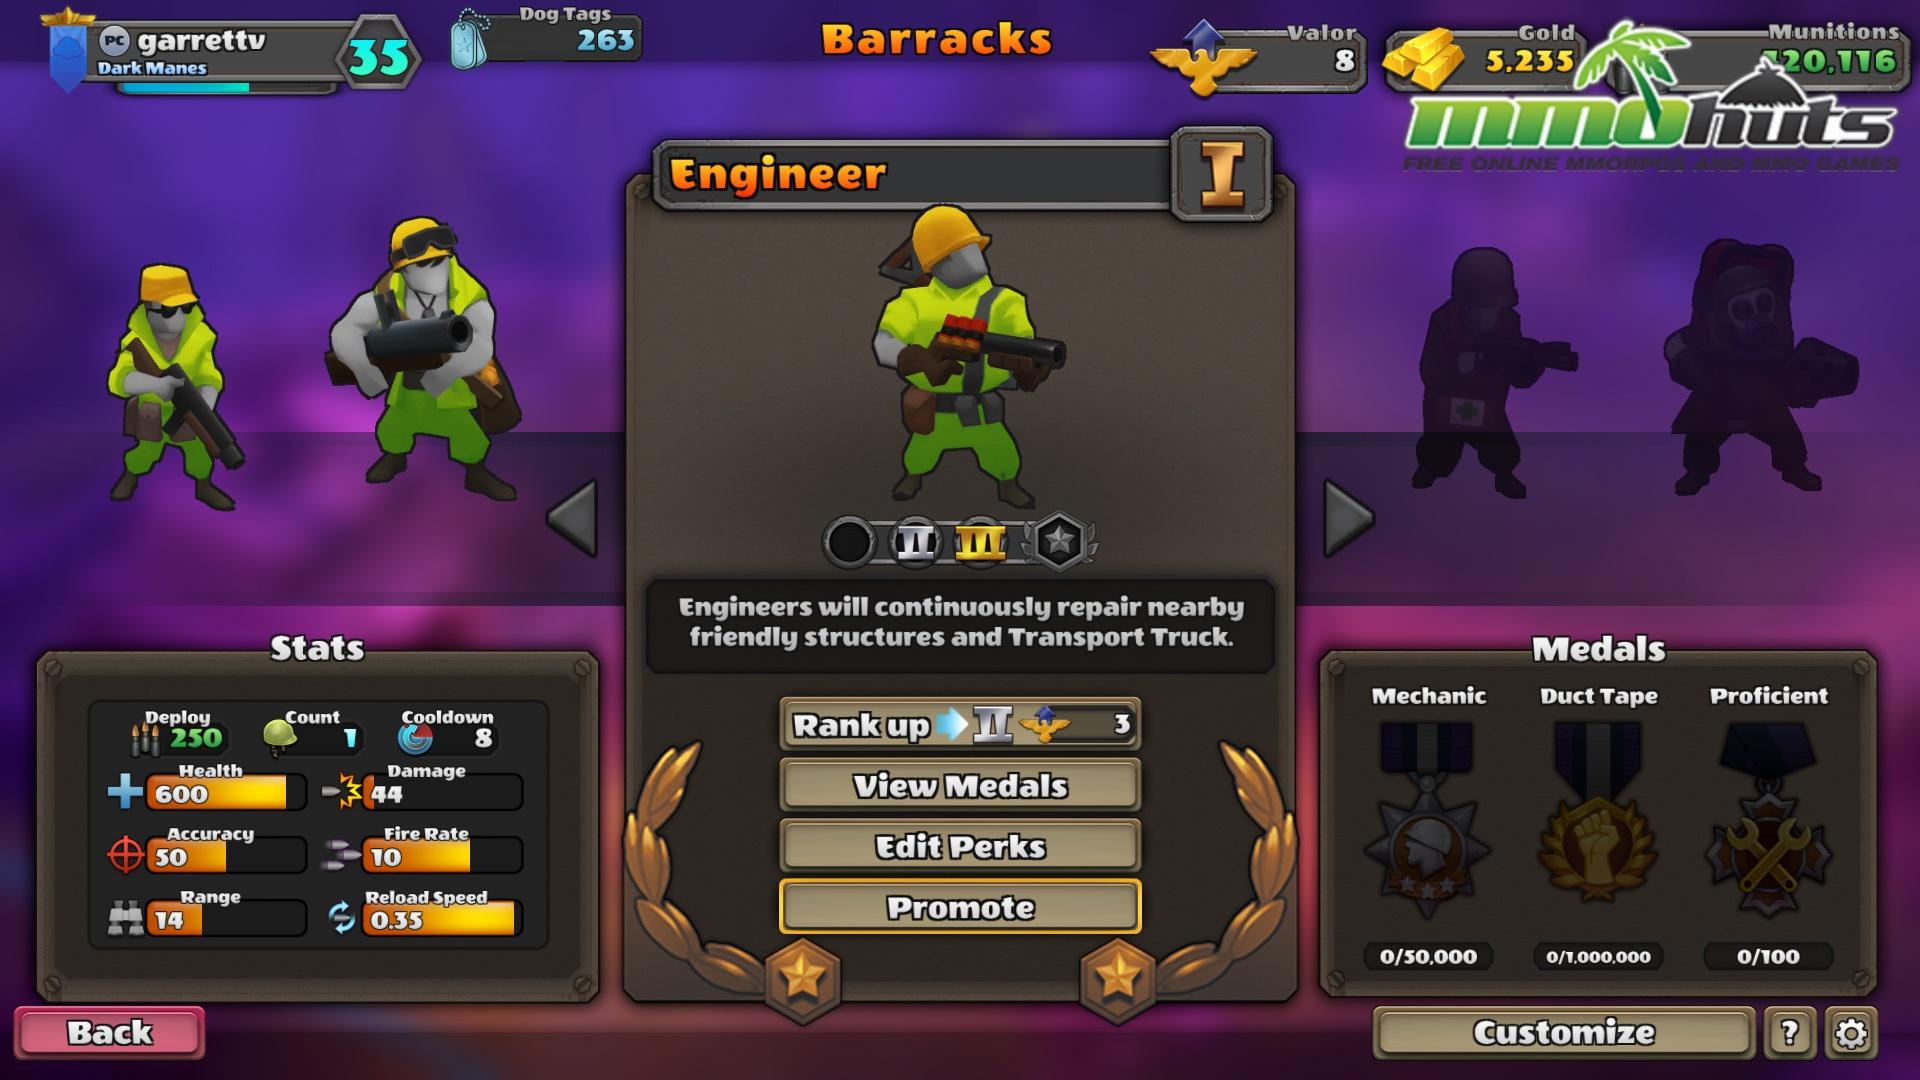 Guns Up!_Barracks